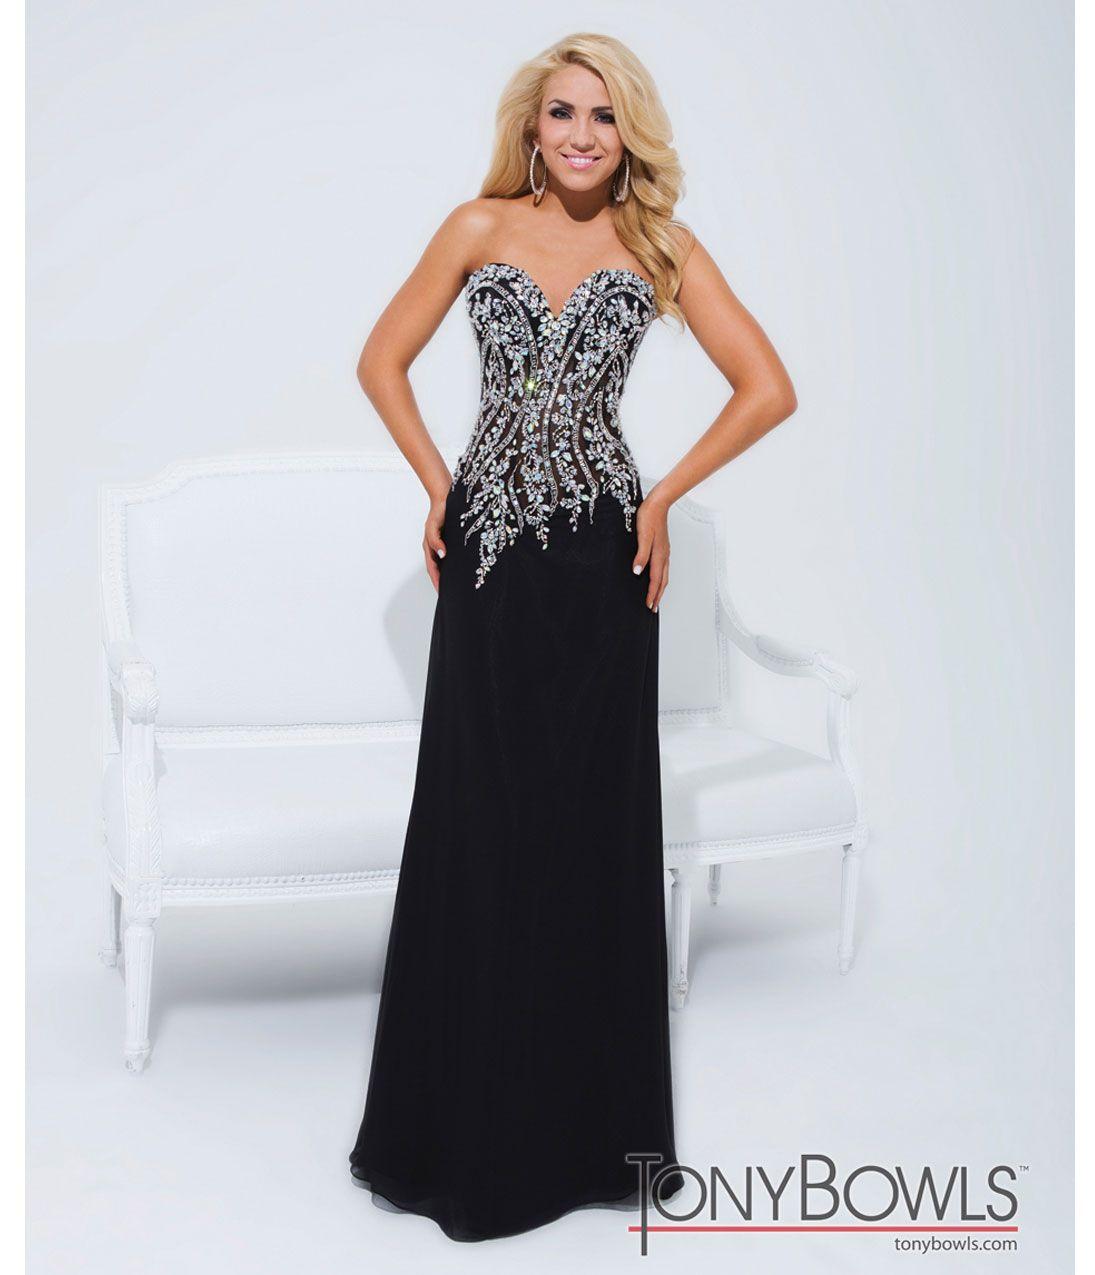 Tony Bowls 2014 Prom Dresses - Black Rhinestone Beaded Strapless ...